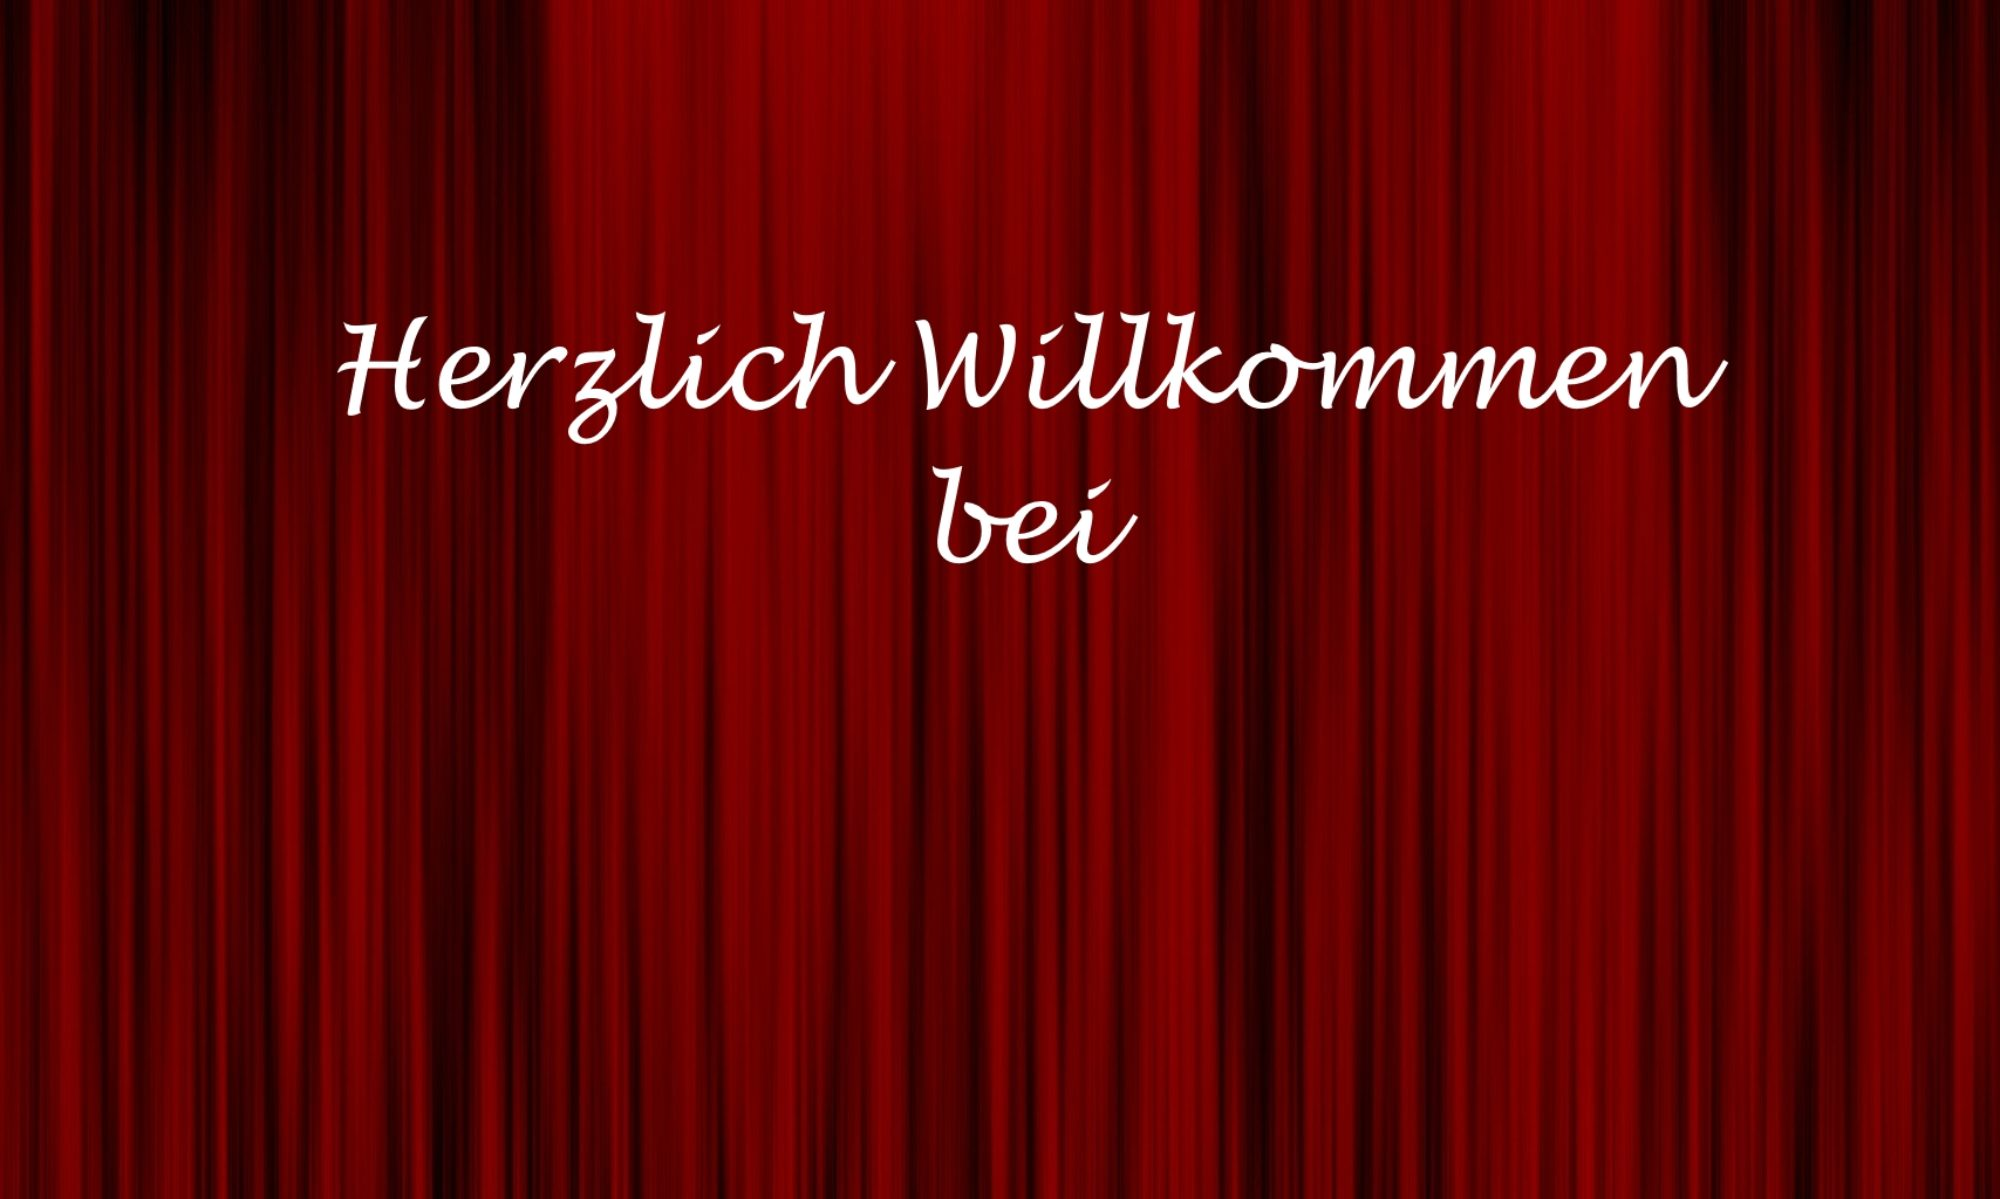 Burgstalltheater Burg e.V.